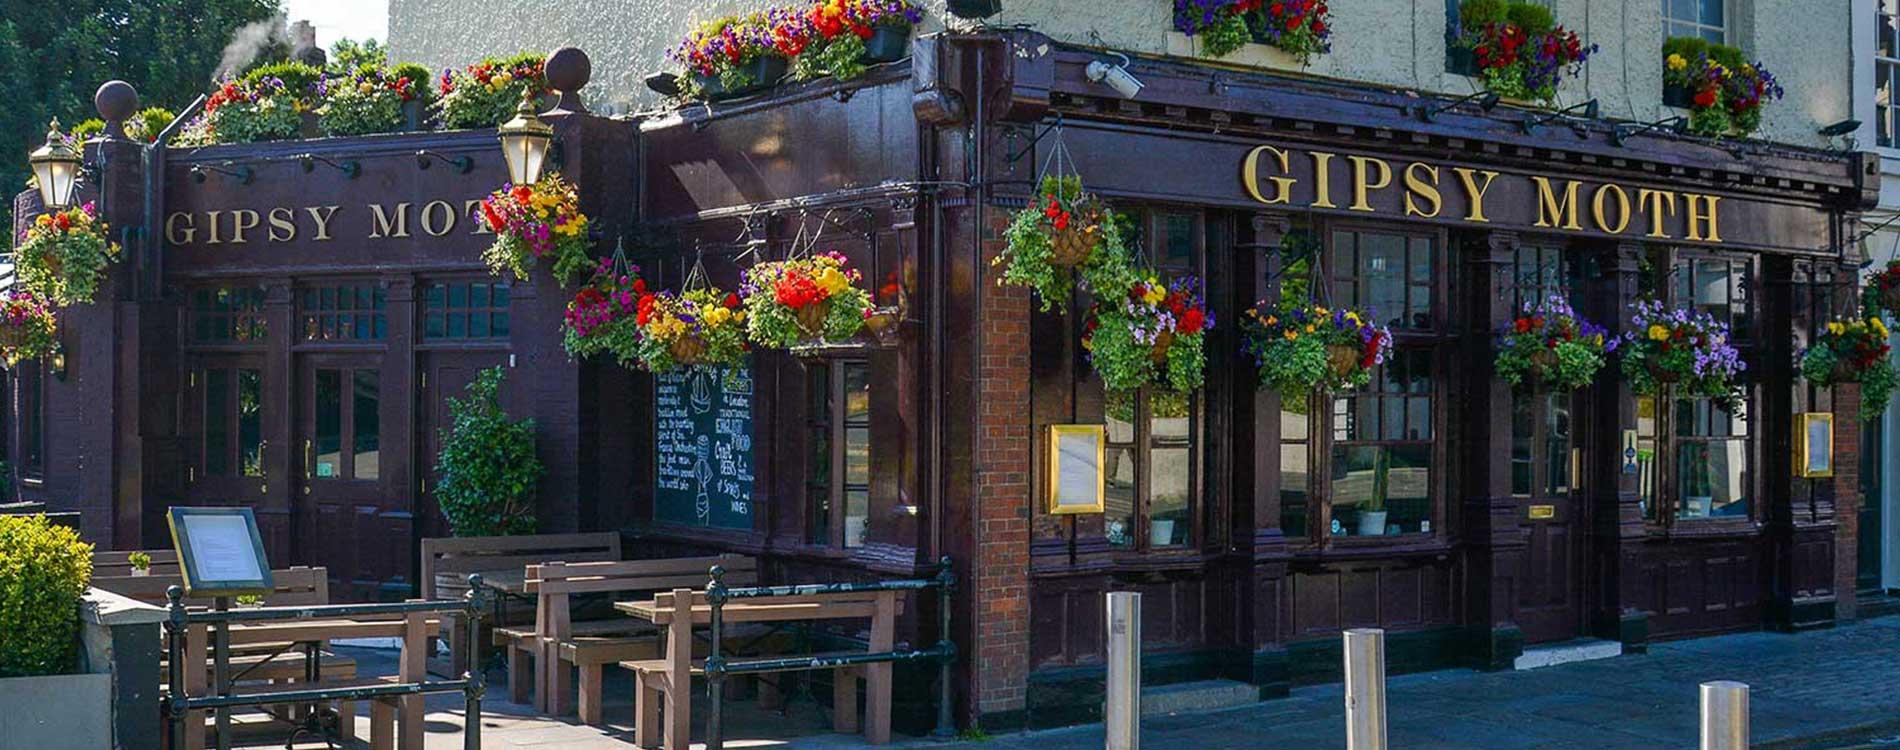 gipsy moth pub in greenwich where axis undertook internal and external refurbishment